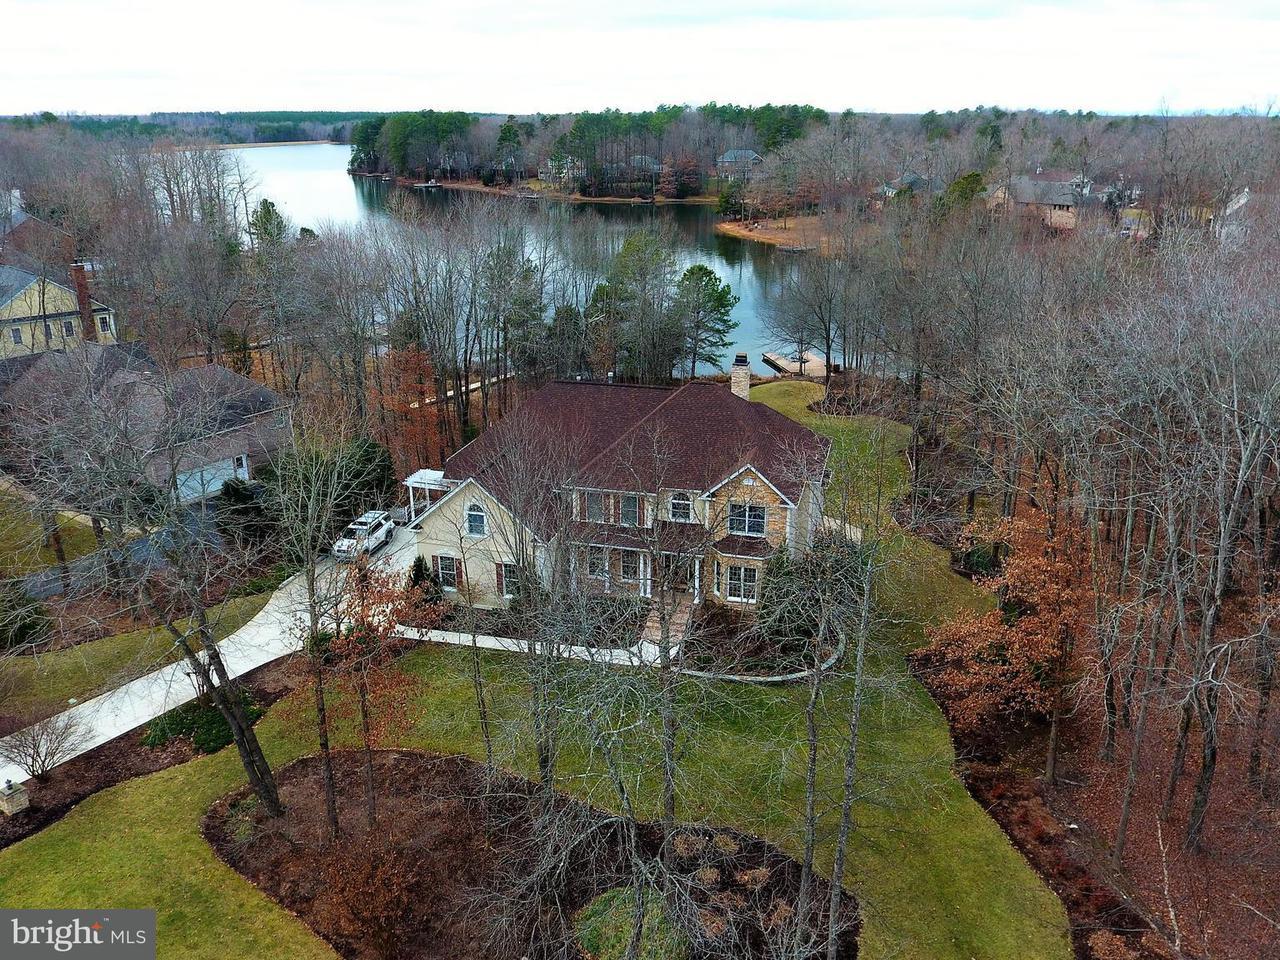 Single Family Home for Sale at 11204 Fawn Lake Pkwy 11204 Fawn Lake Pkwy Spotsylvania, Virginia 22551 United States